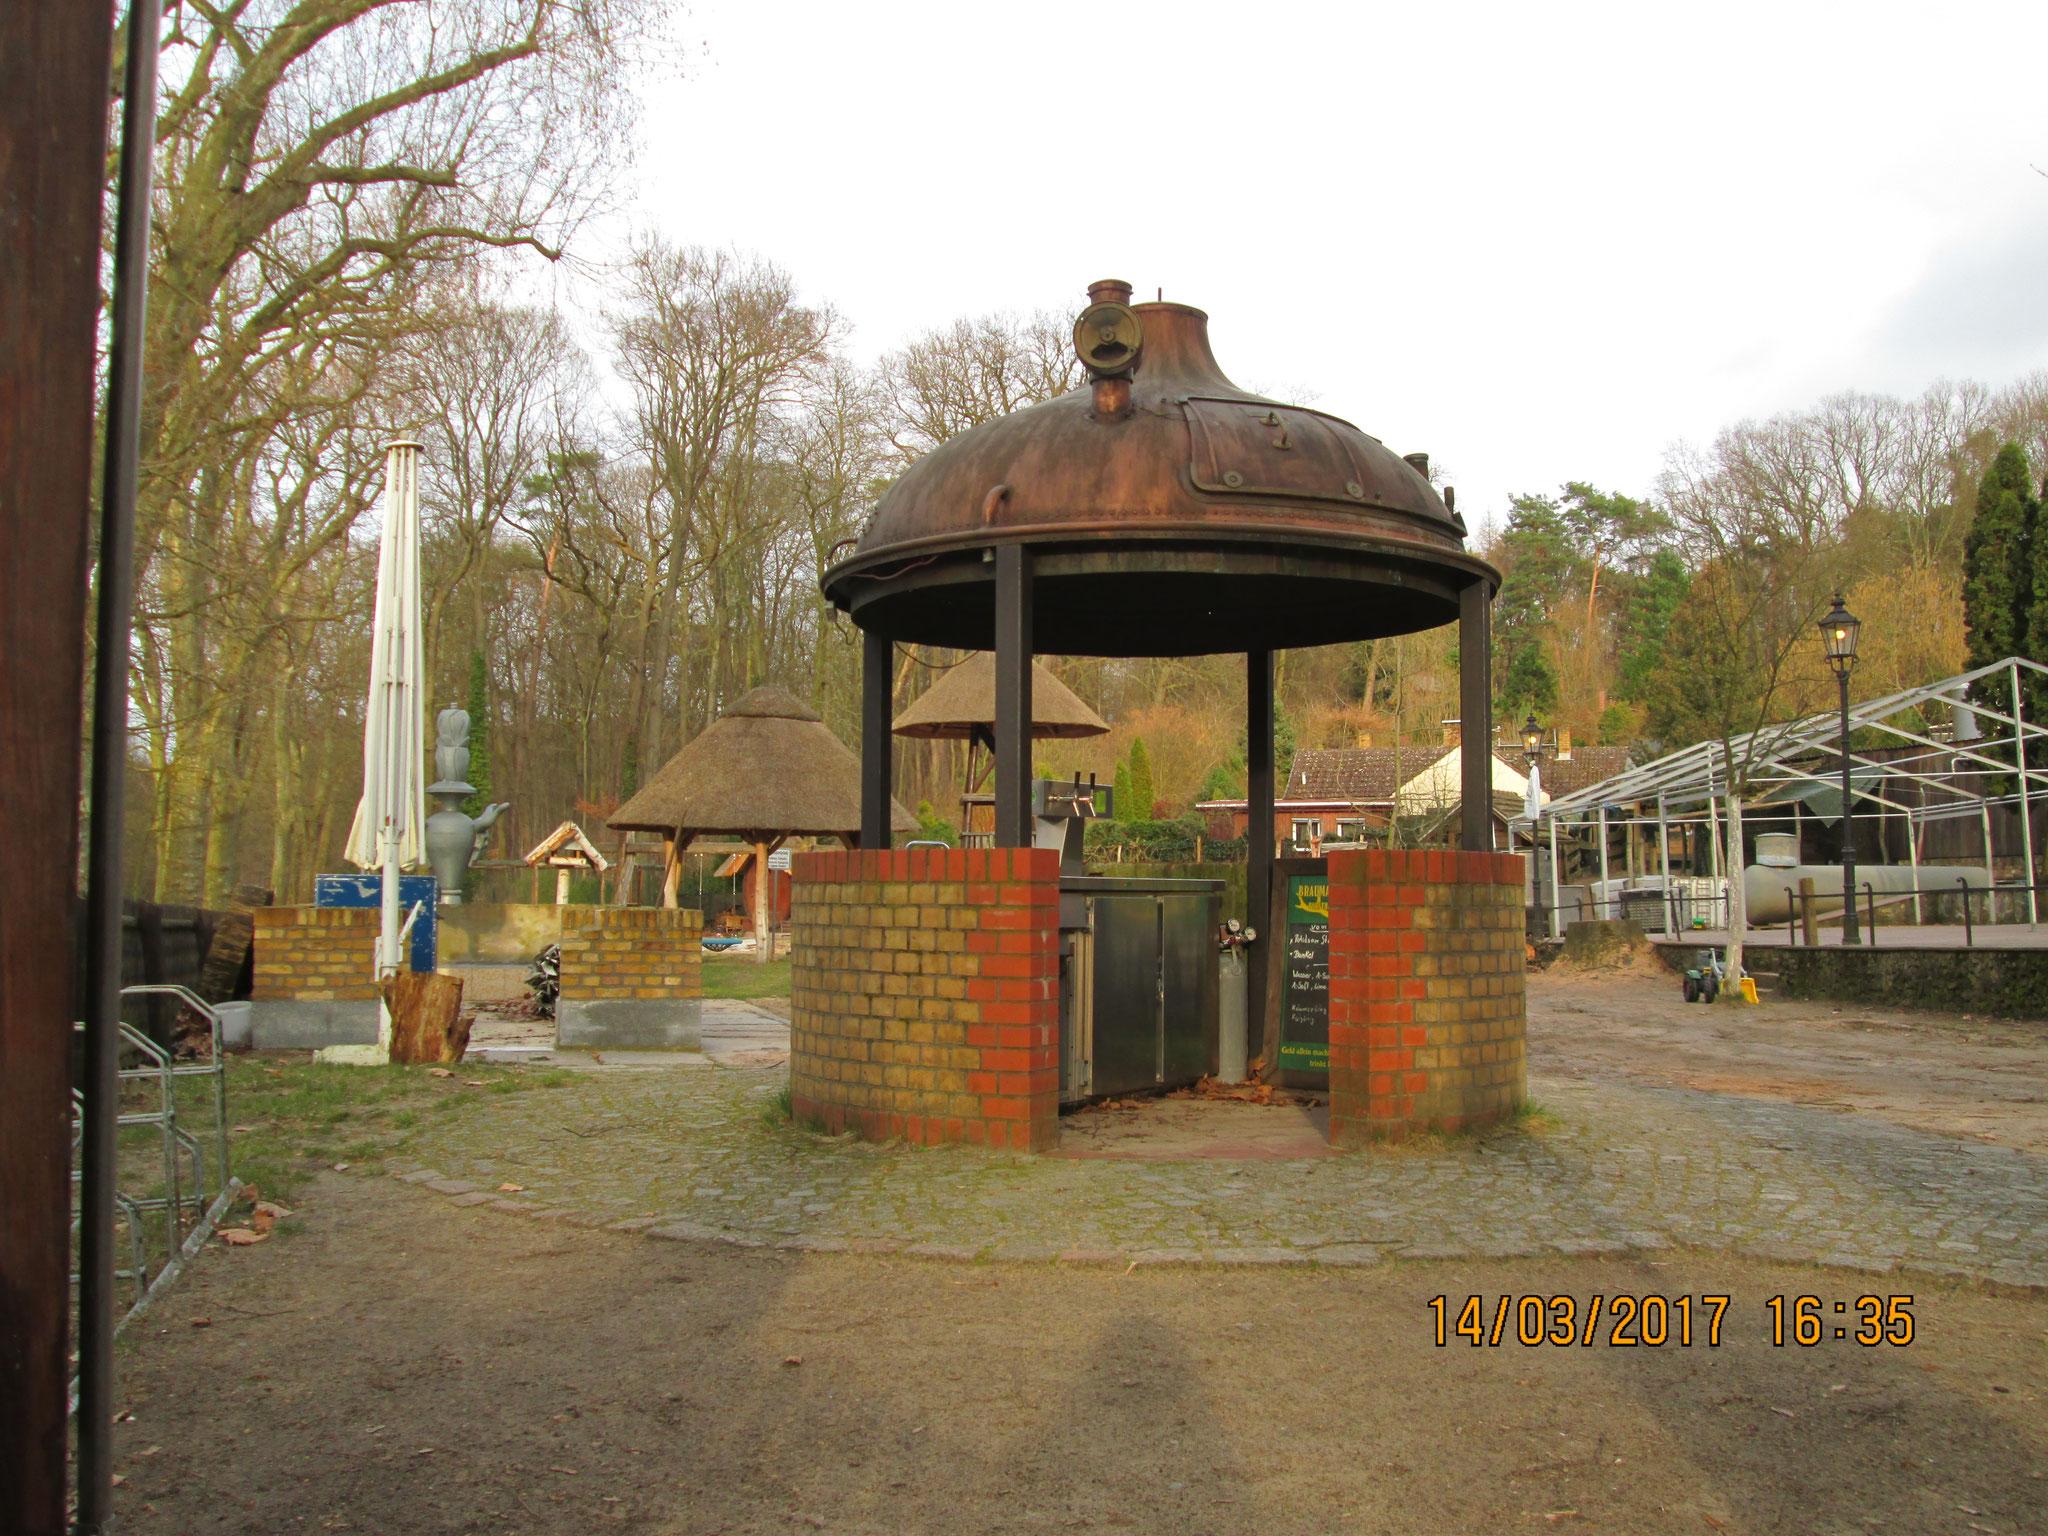 Braumanufaktur Forsthaus Templin